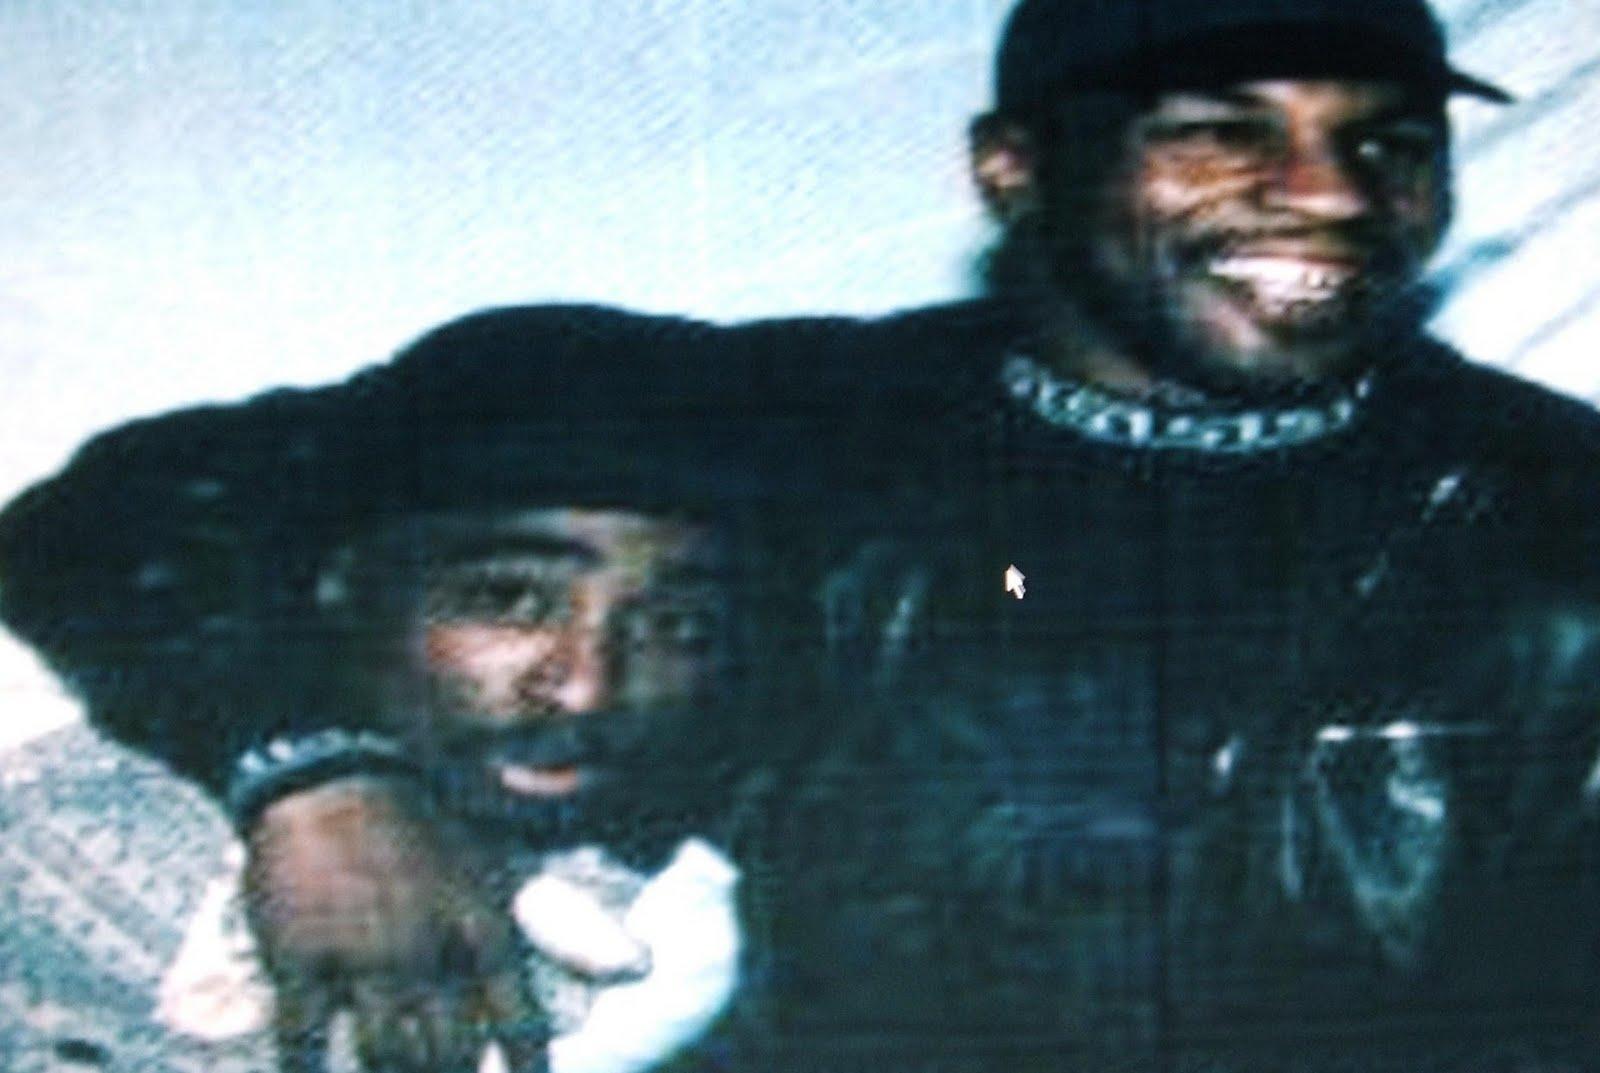 http://4.bp.blogspot.com/_KDxbyvAi_QY/TIf2ISe9lKI/AAAAAAAAACU/-ggovgUlApI/s1600/Mike-Tyson-Pac.jpg